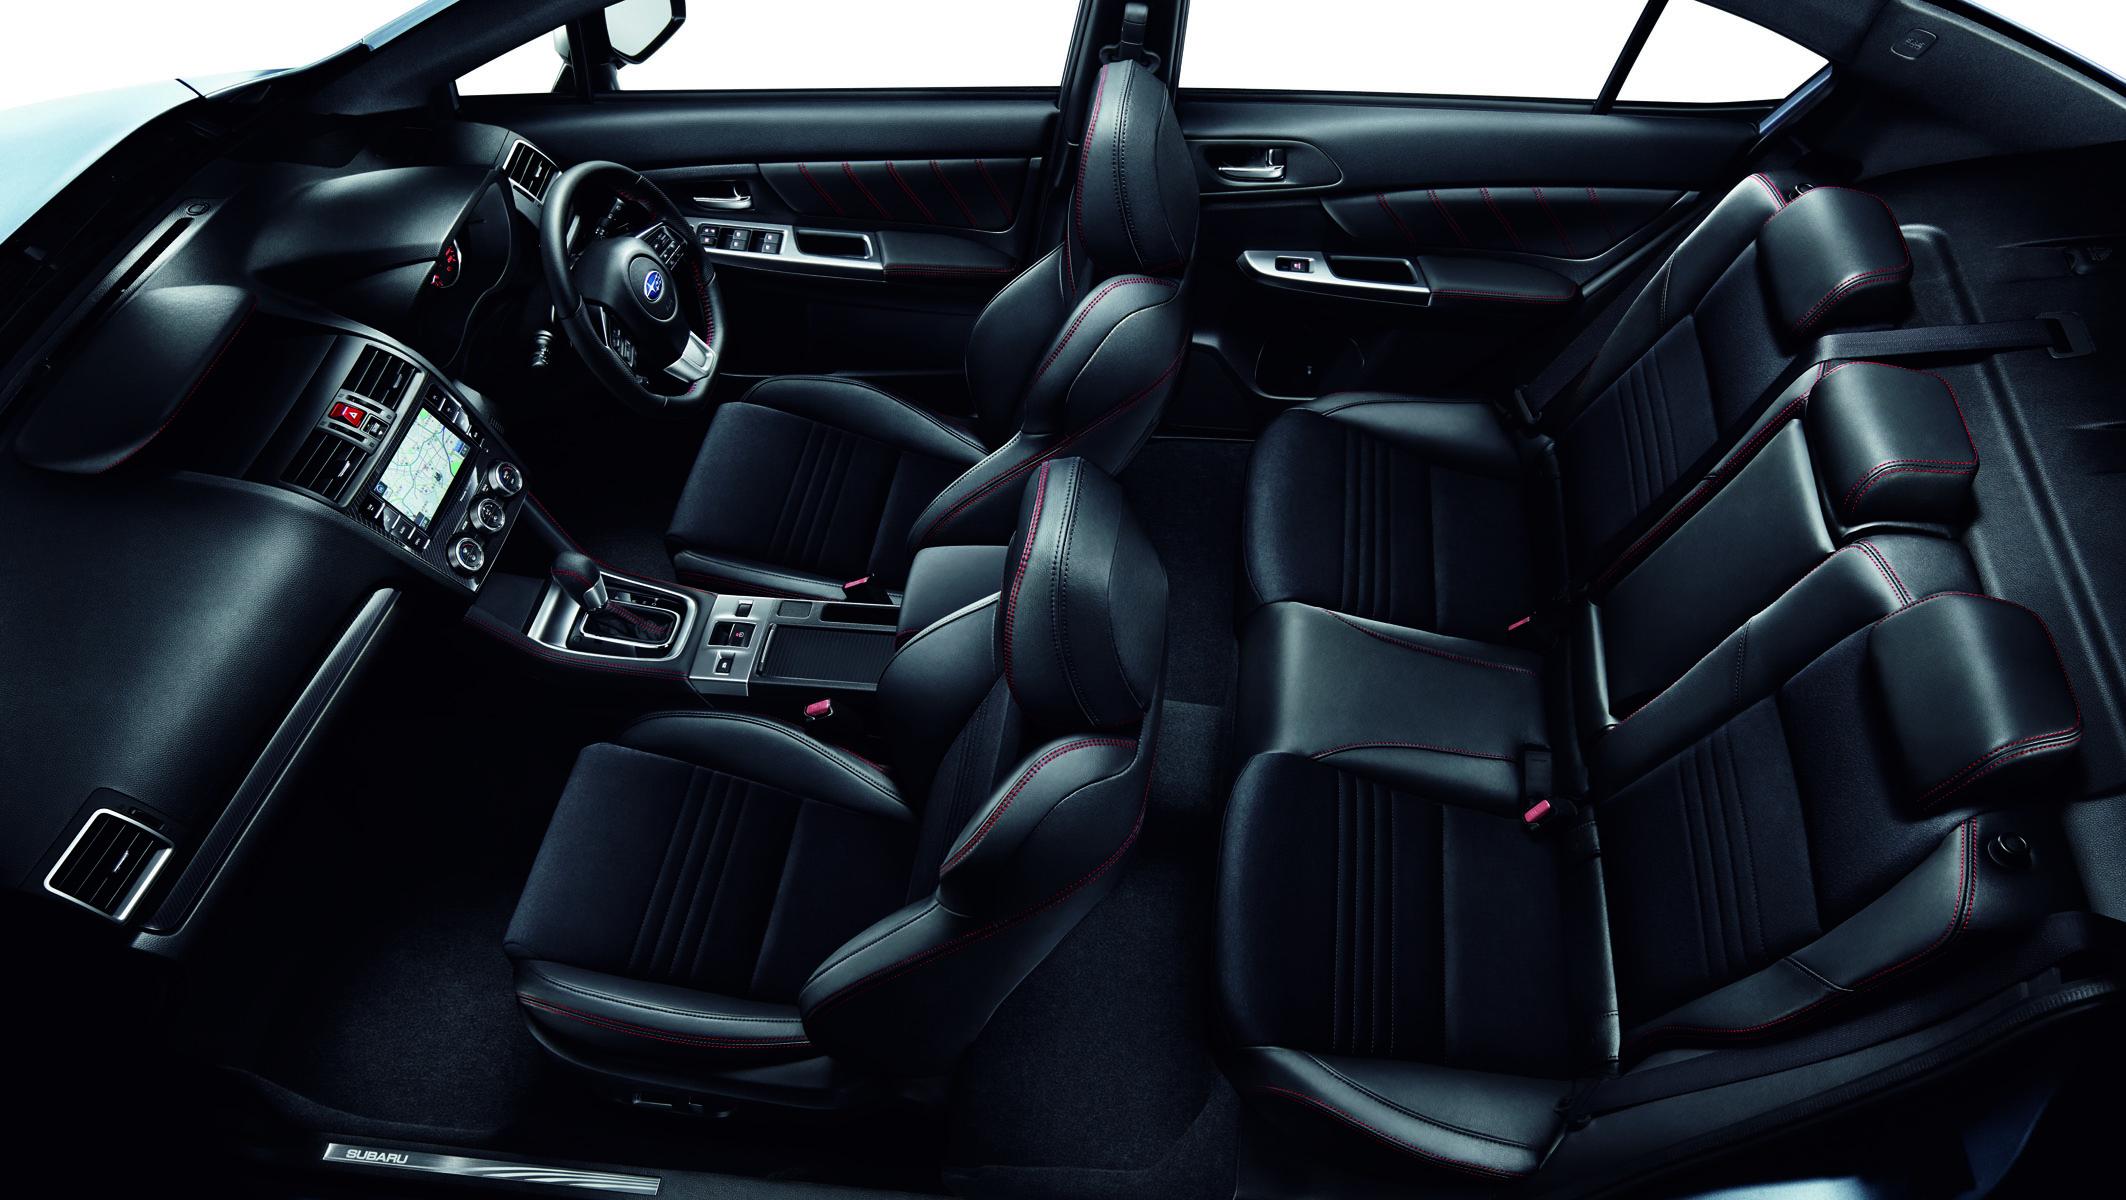 2014 Subaru WRX S4